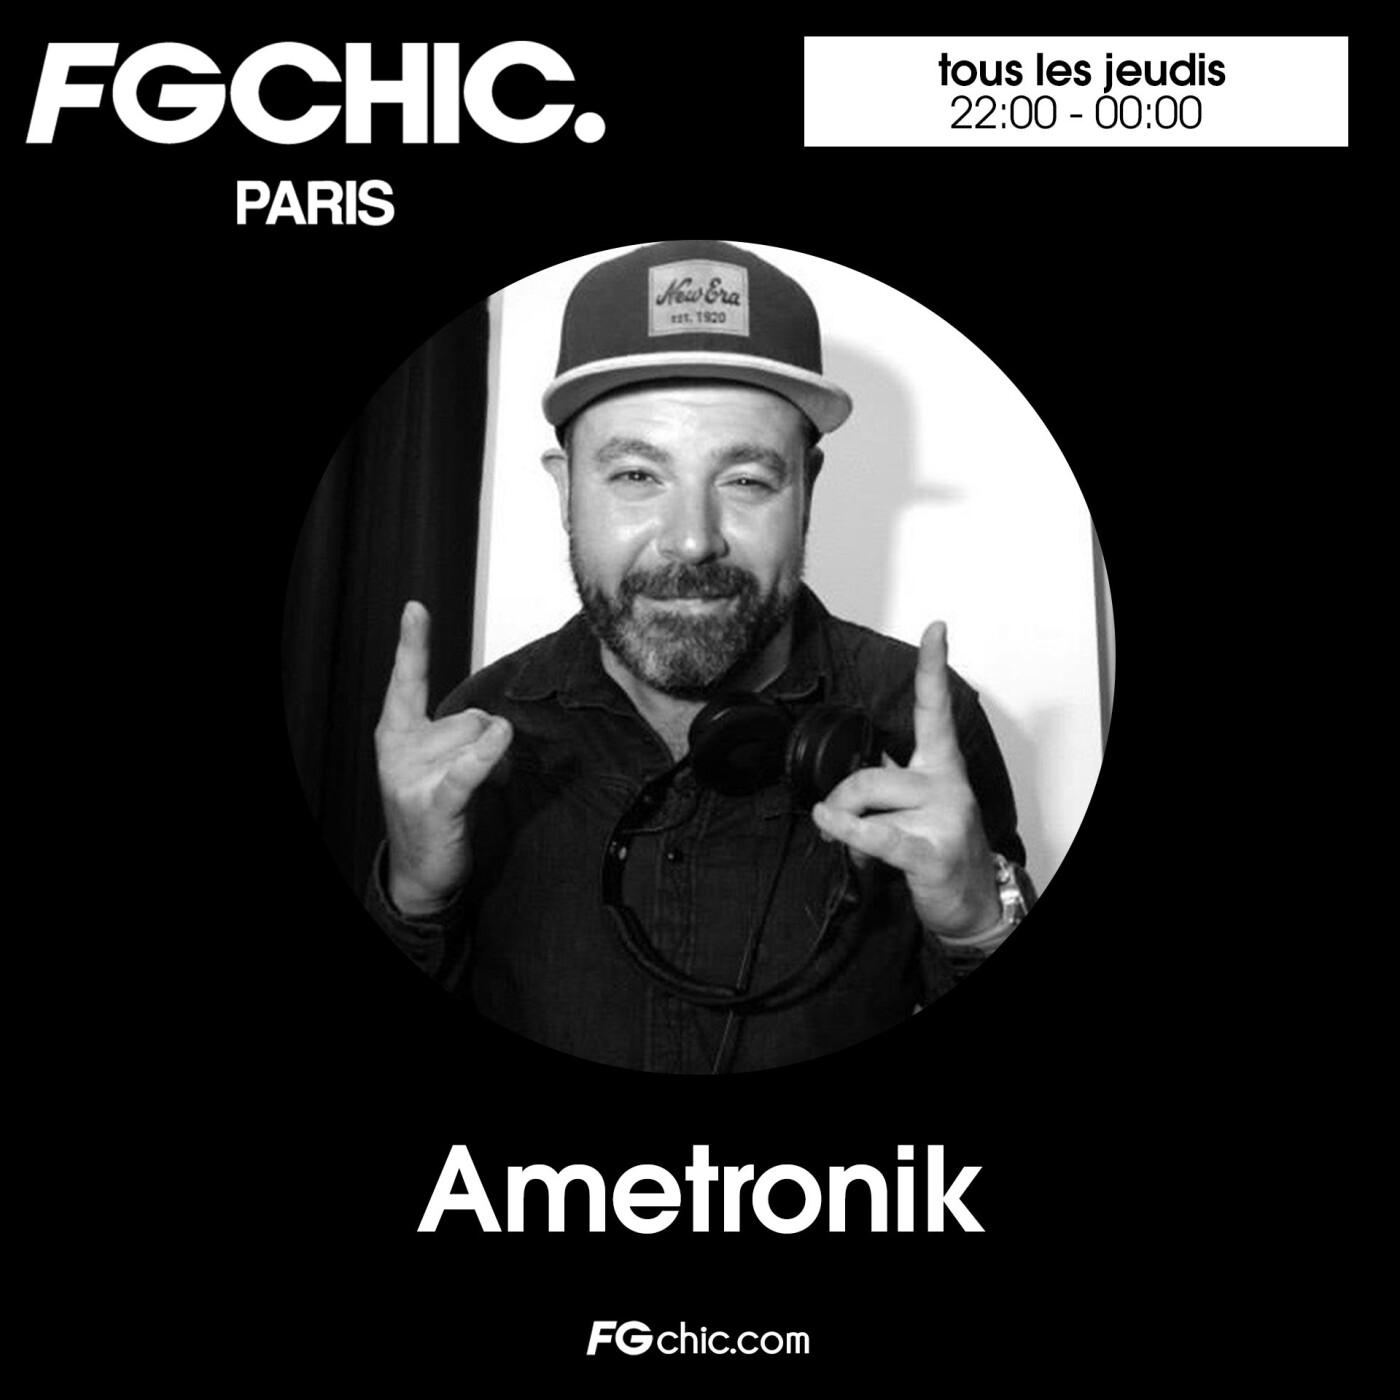 FG CHIC MIX BY AMETRONIK